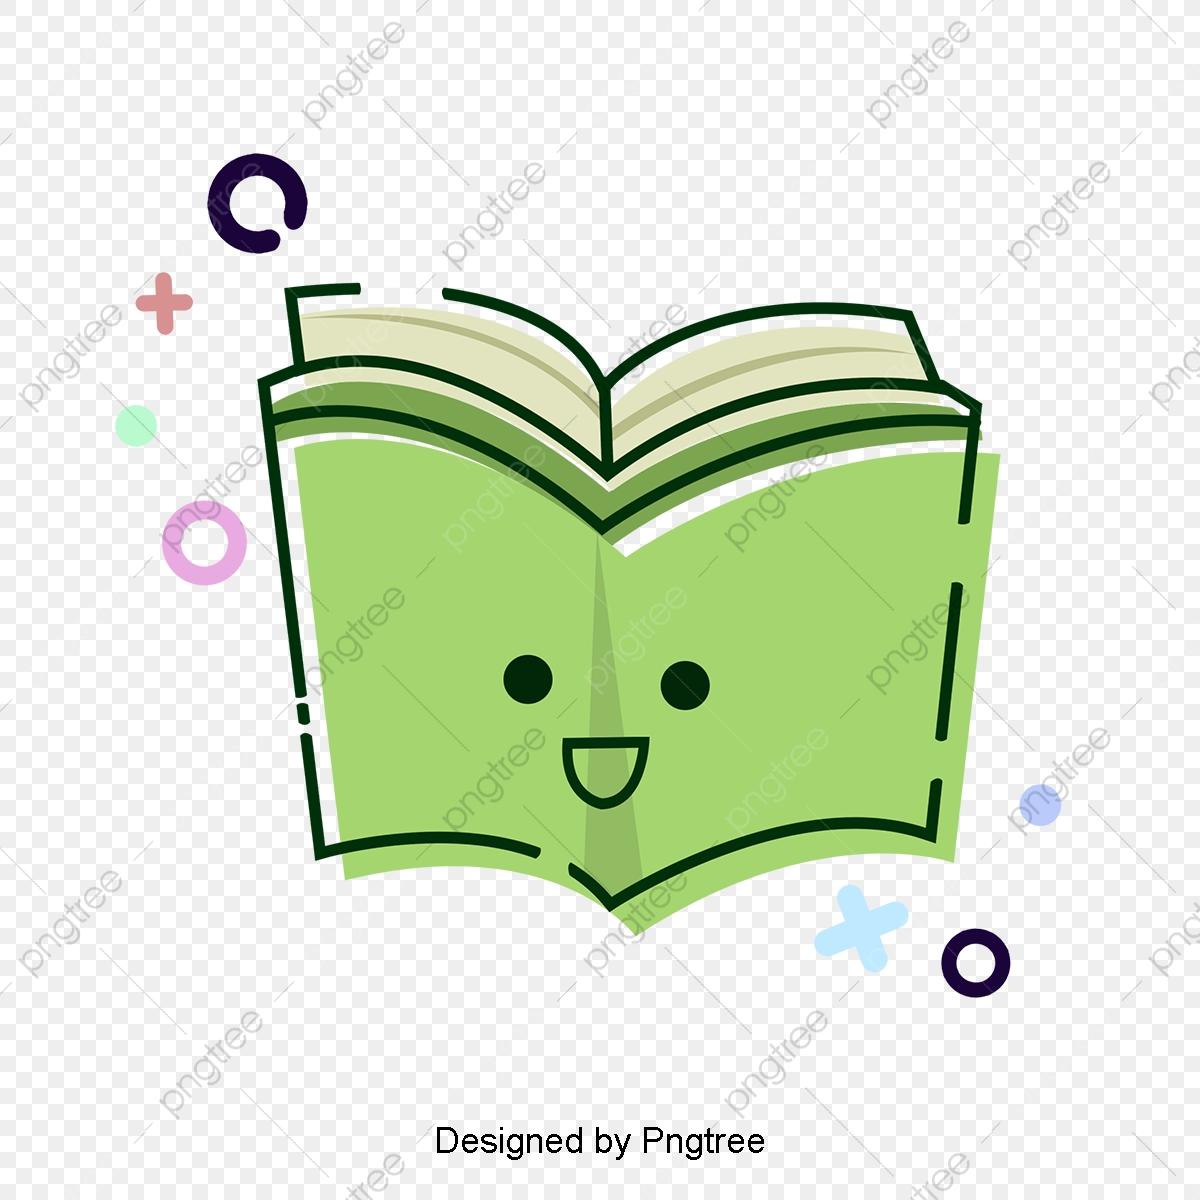 Books clipart cute. Green knowledge ocean elements